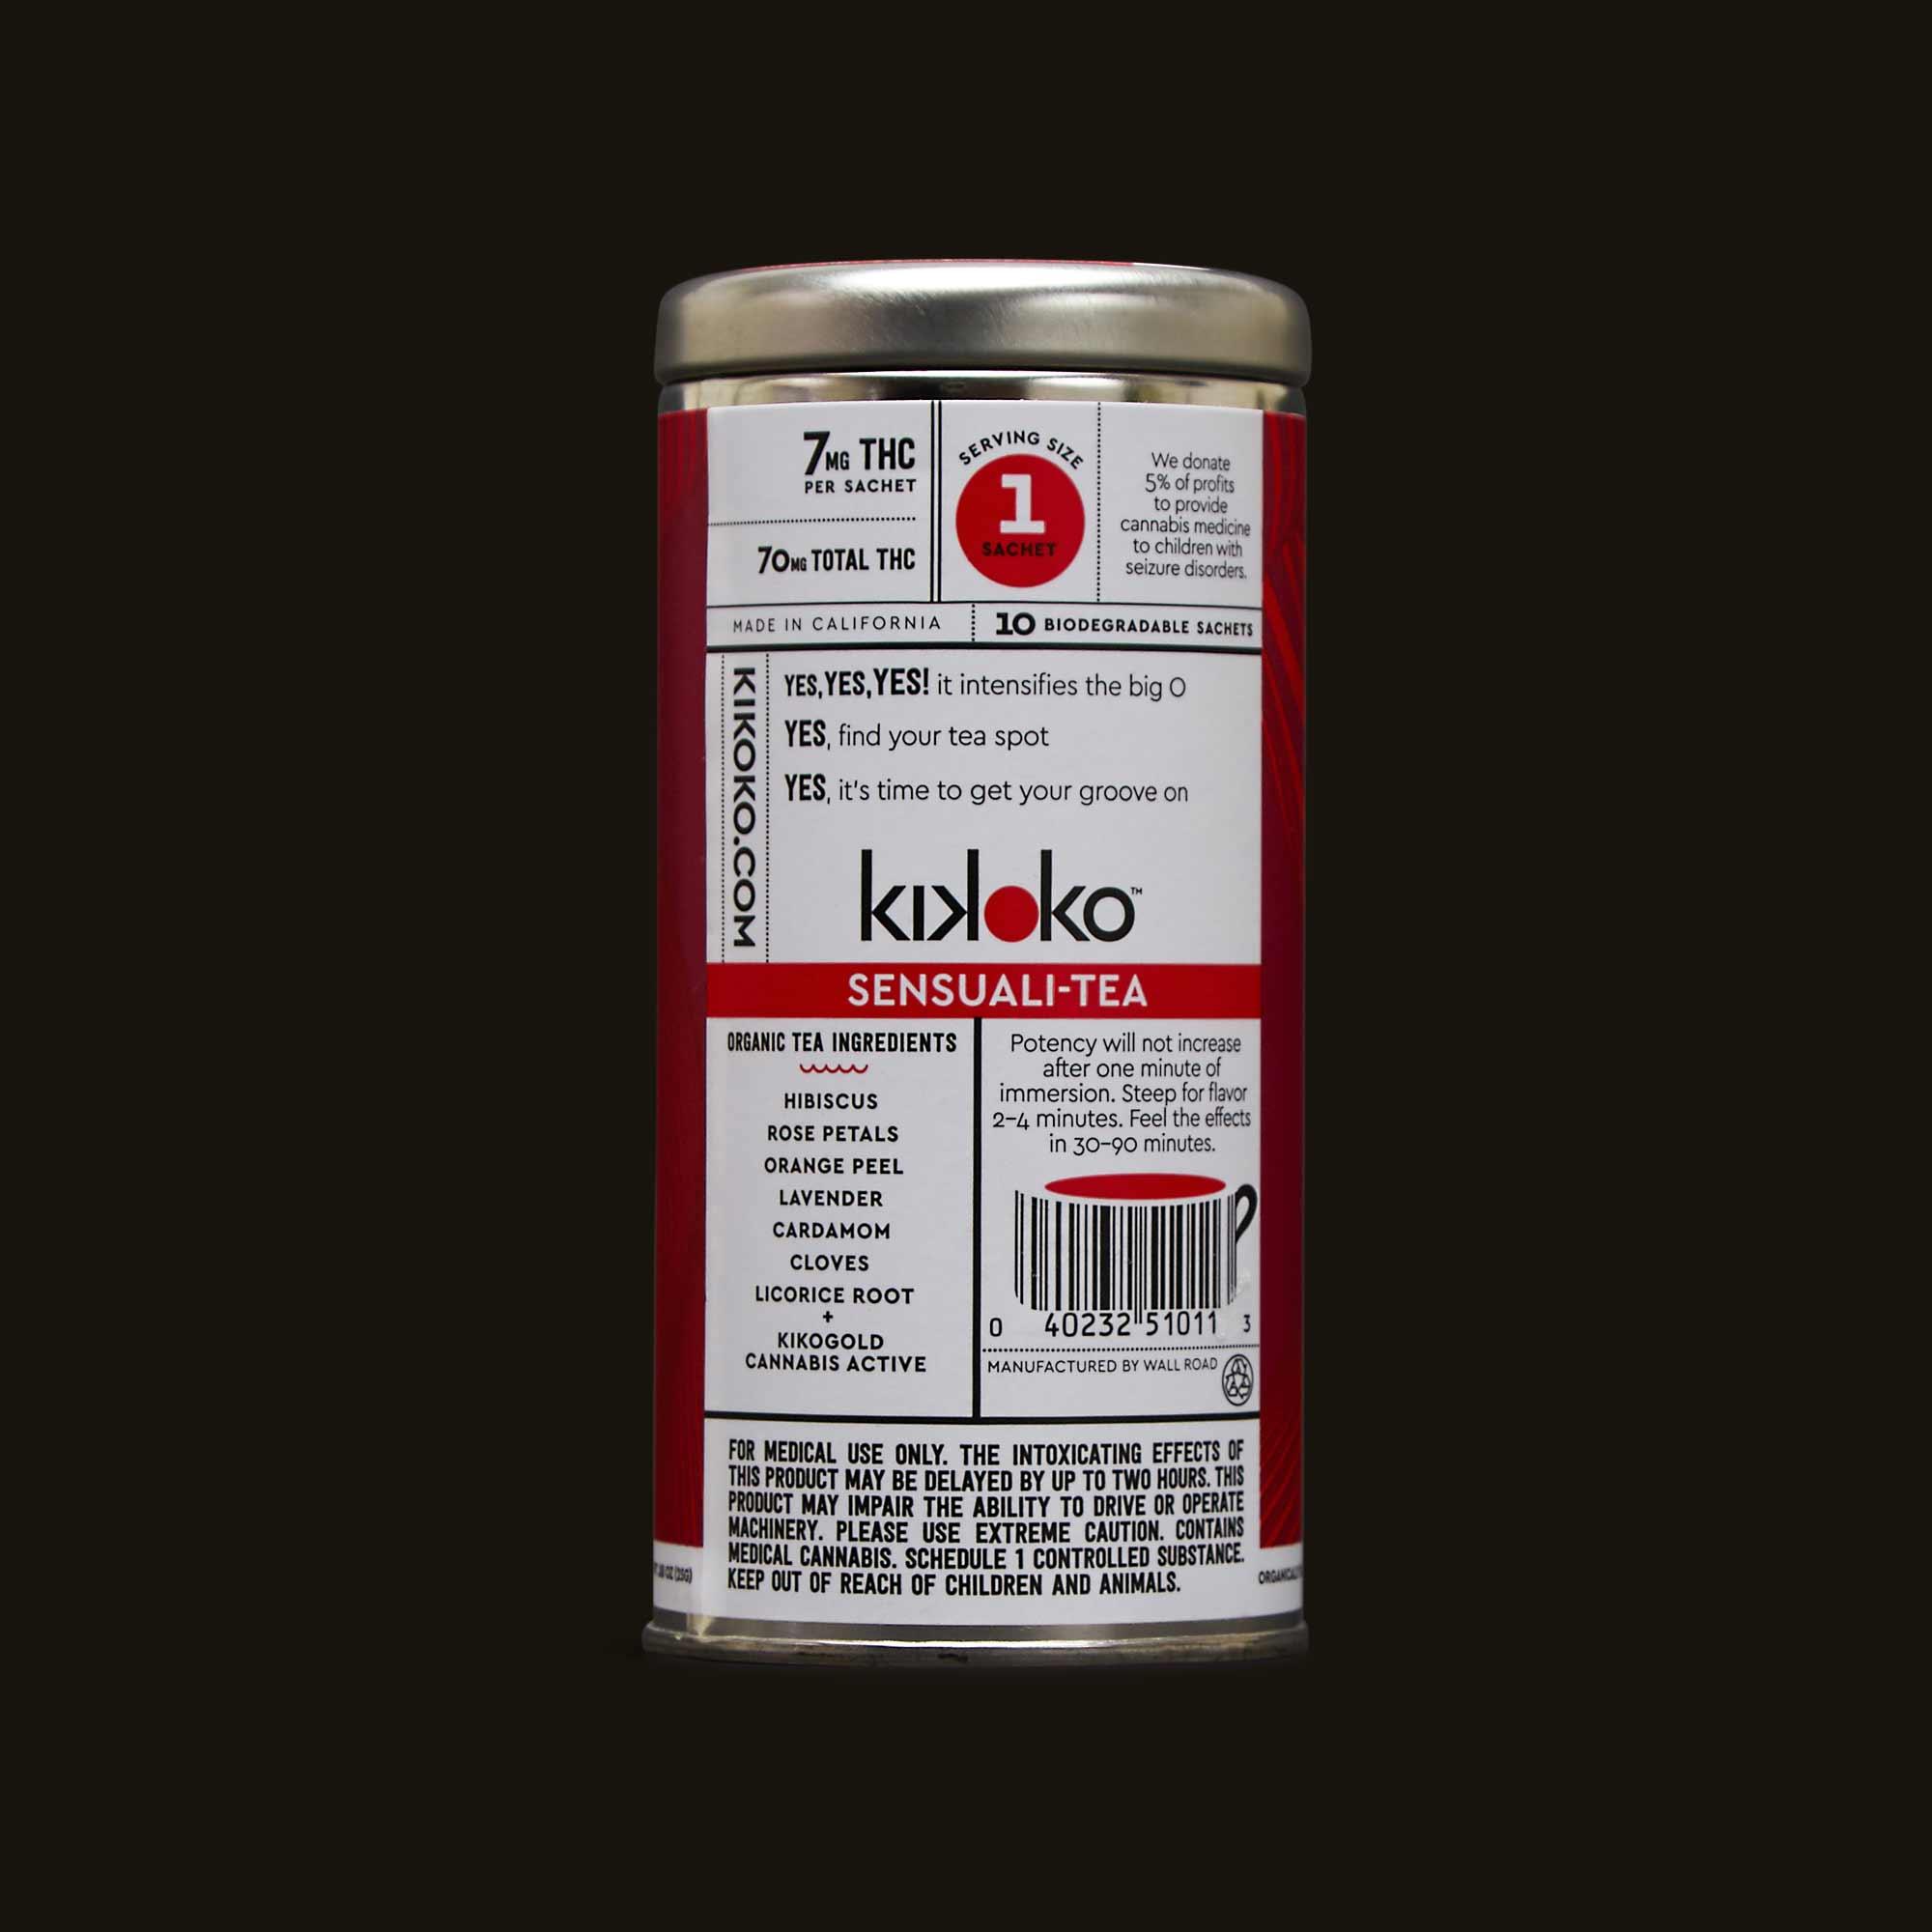 Sensuali tea ingredients and warning labels